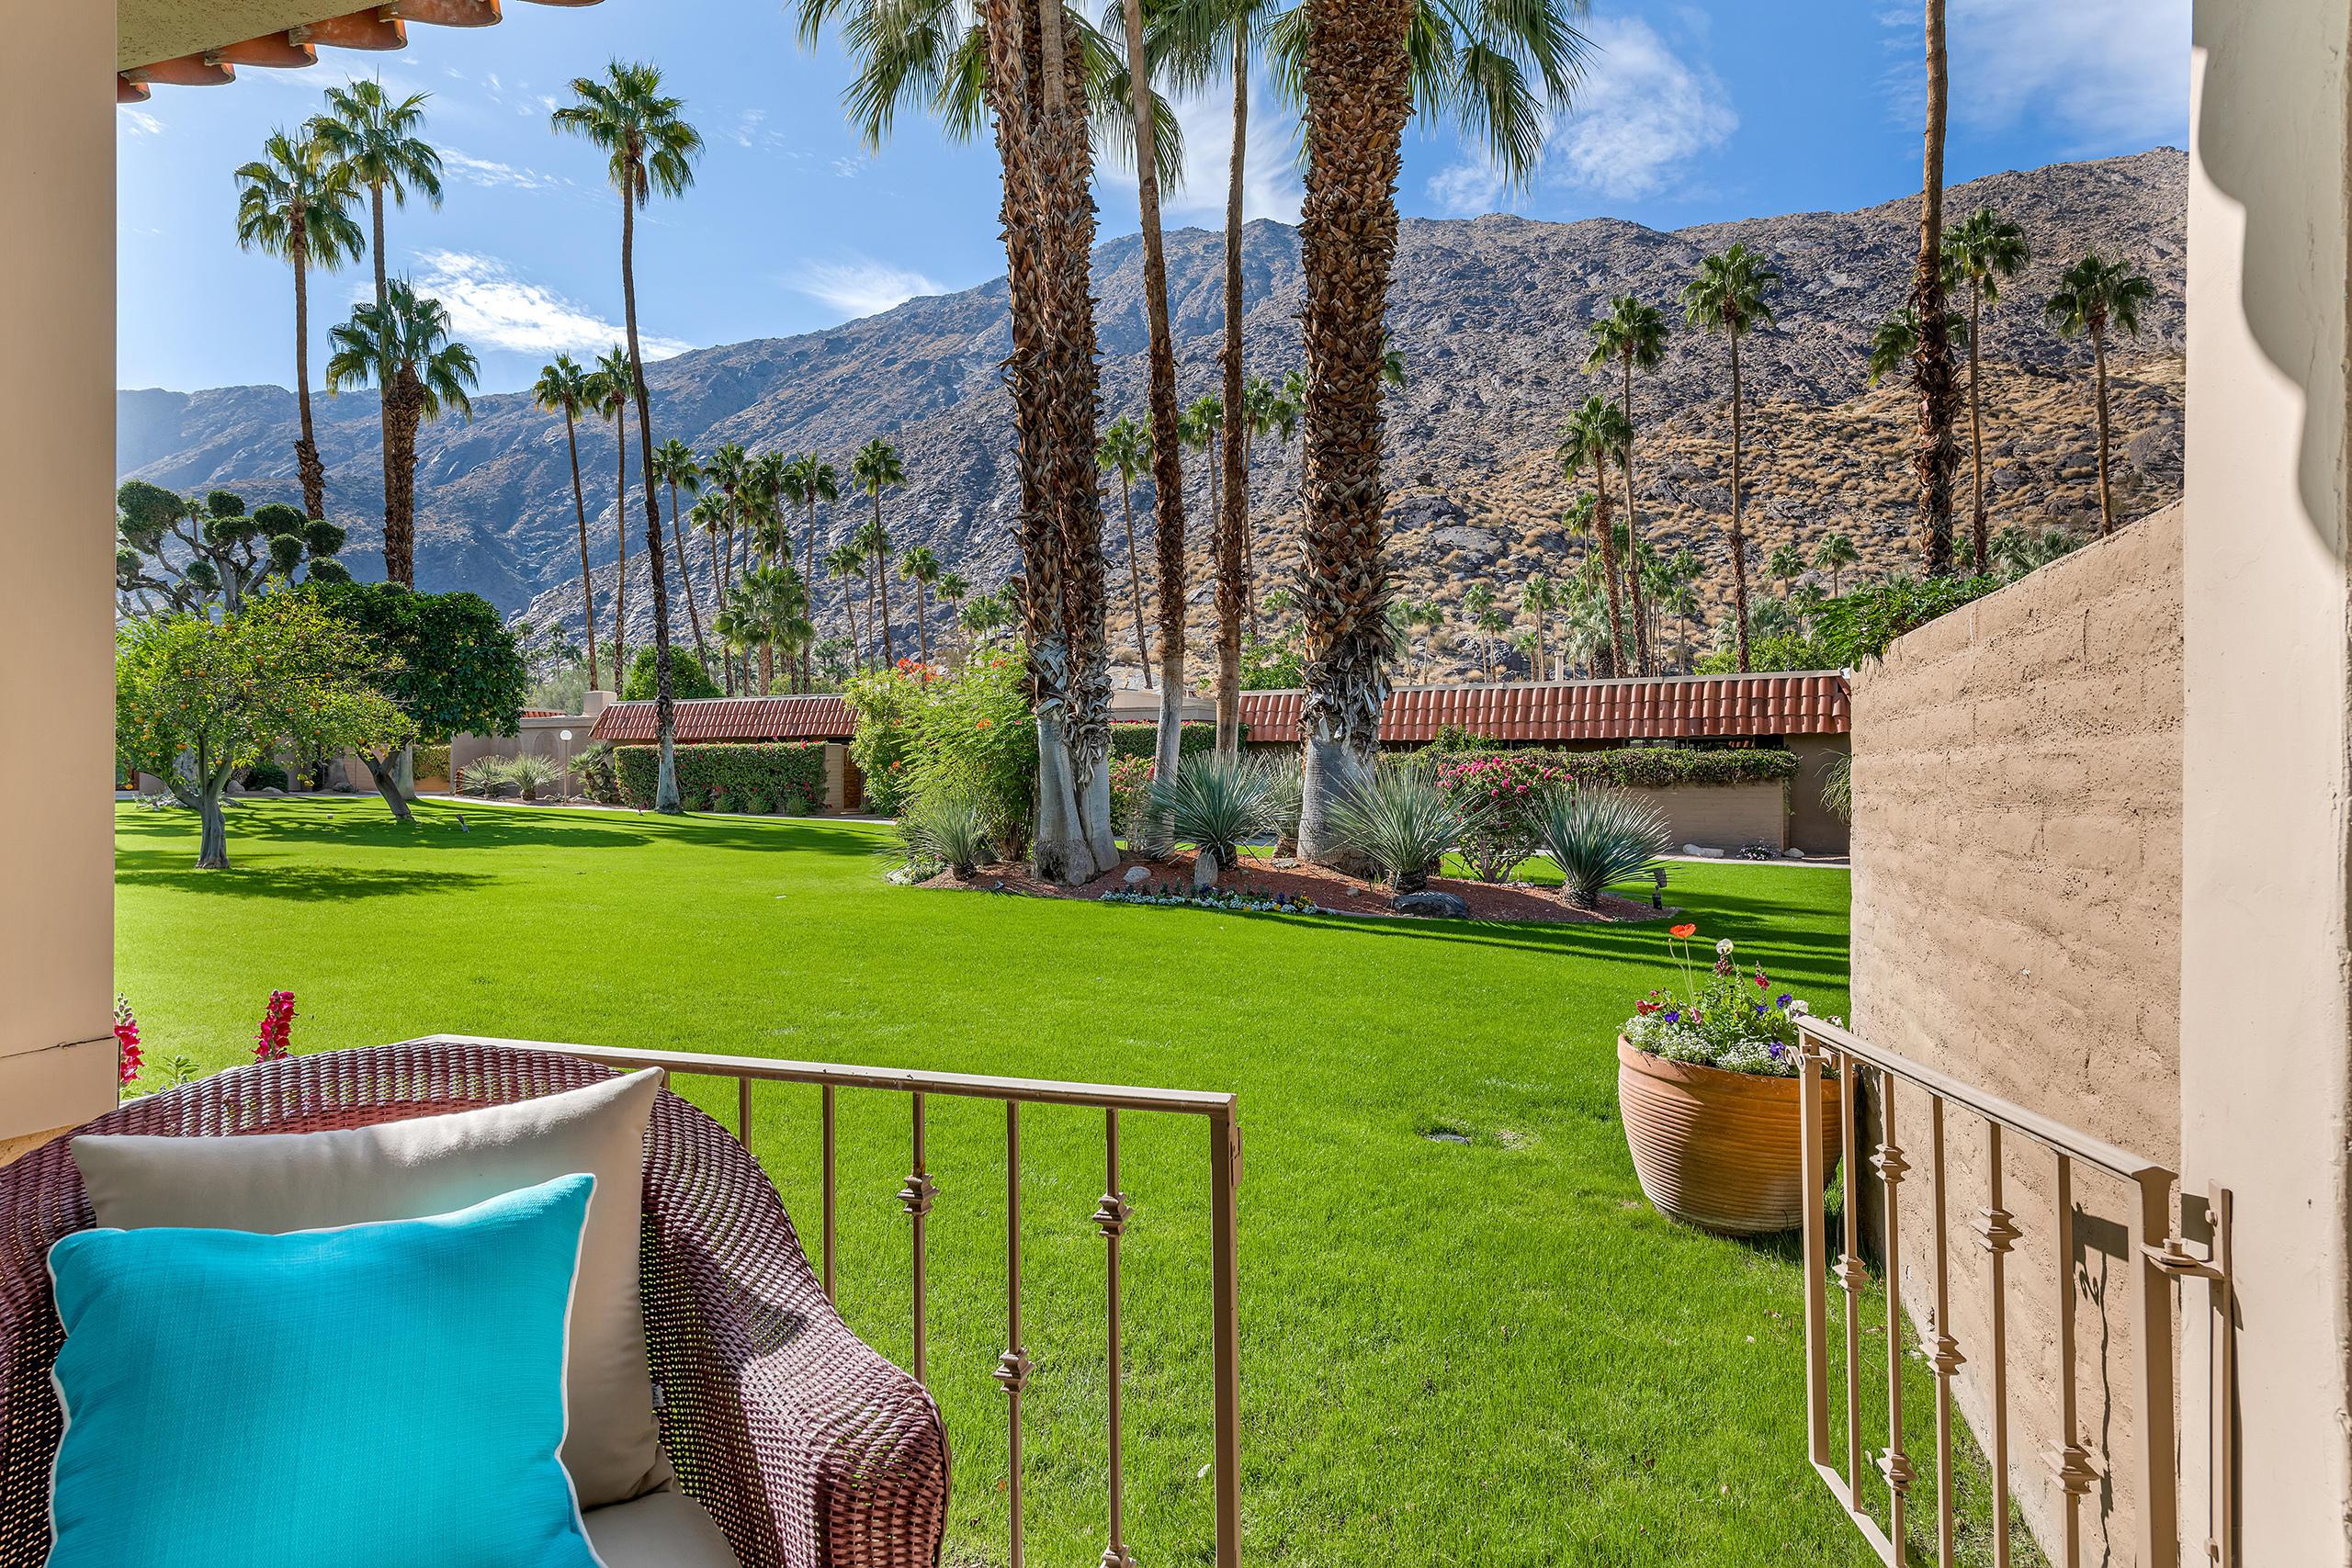 555 W Baristo Road, Palm Springs, California 92262, 1 Bedroom Bedrooms, ,2 BathroomsBathrooms,Residential,For Sale,555 W Baristo Road,219034189